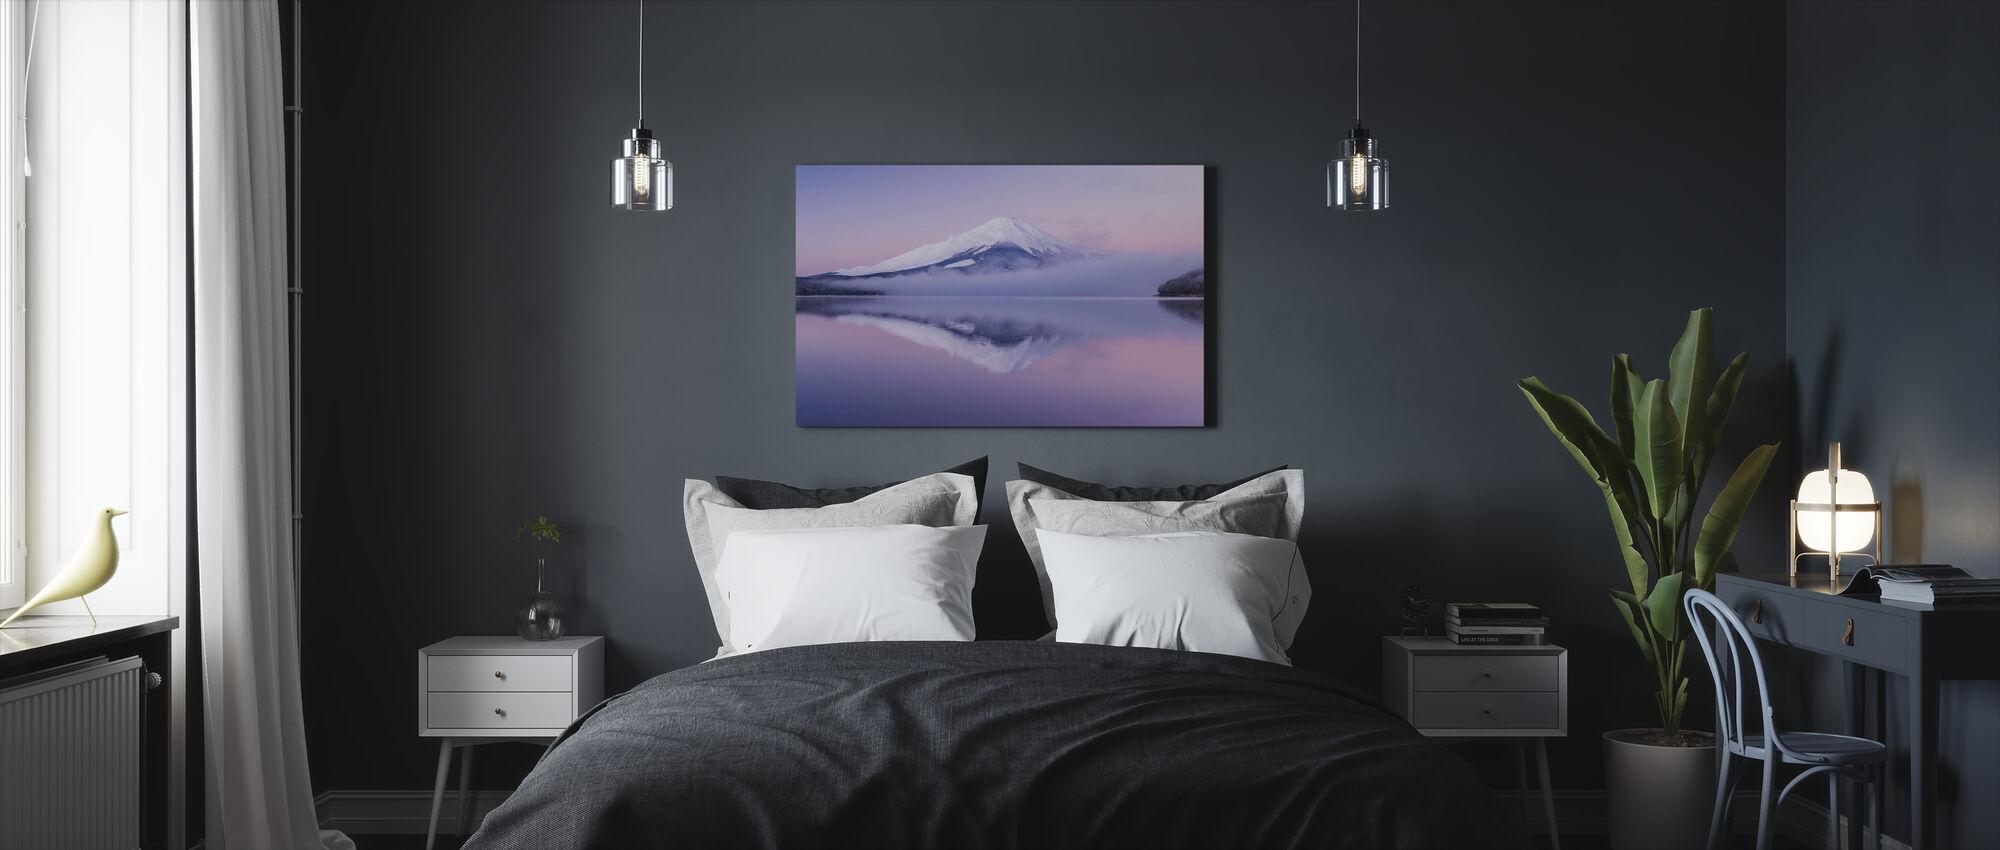 Aamu Veil - Canvastaulu - Makuuhuone